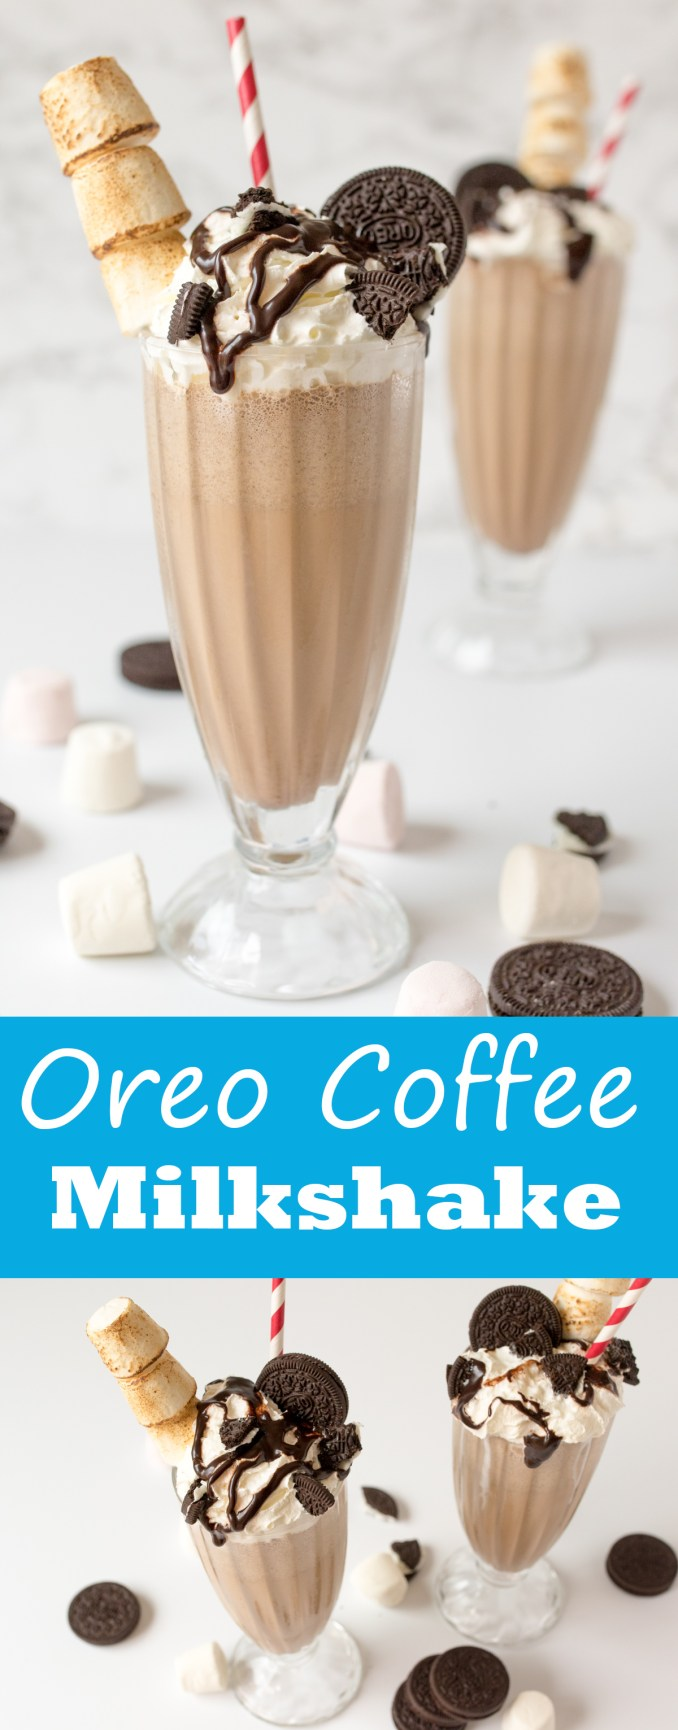 Oreo Coffee Milkshake